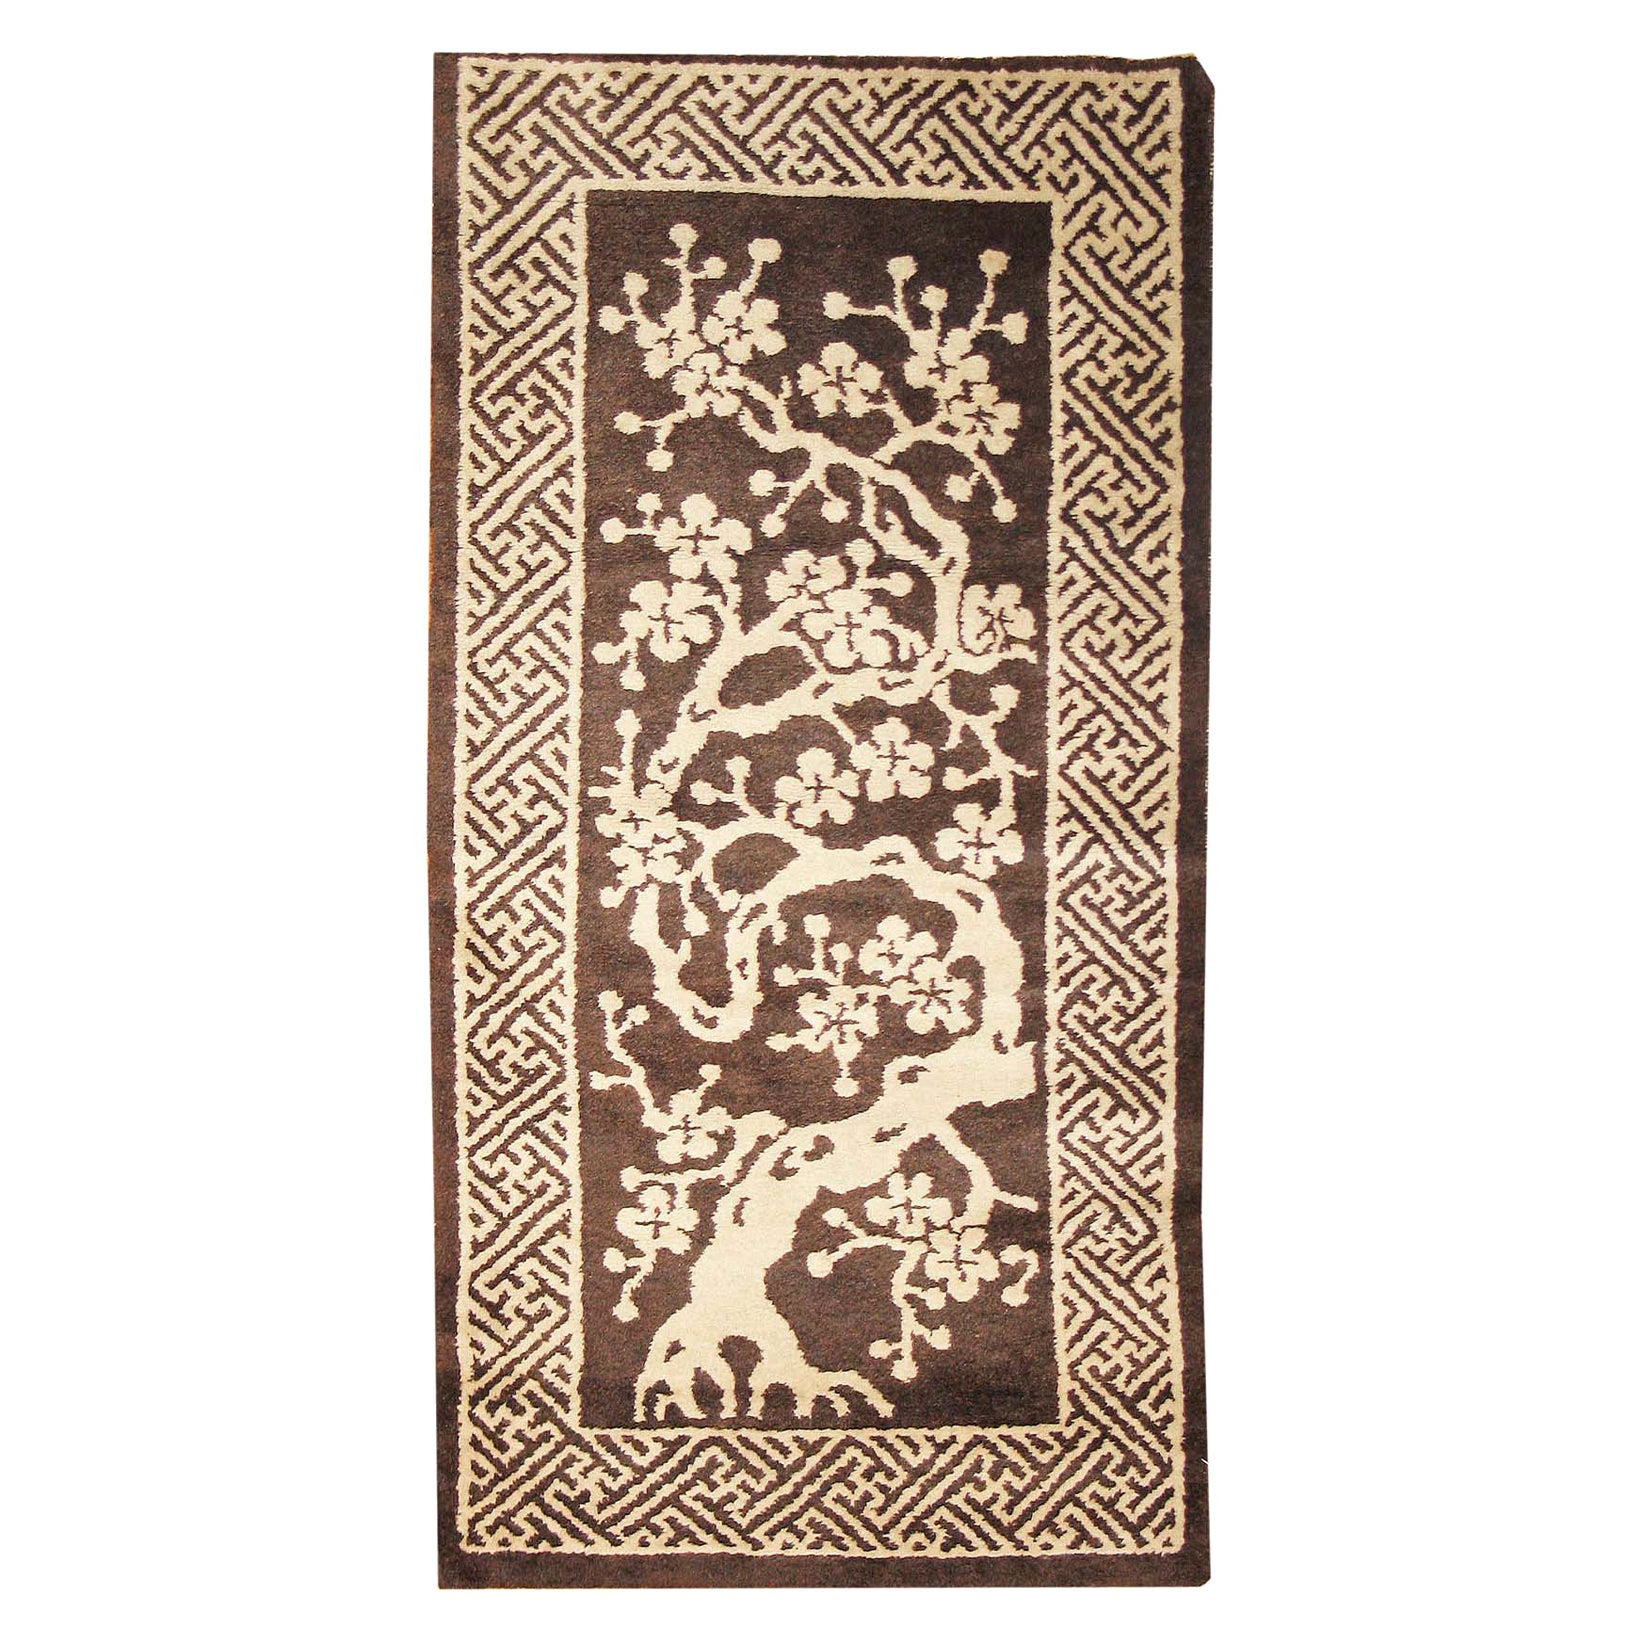 Small Brown Antique Peking Chinese Carpet